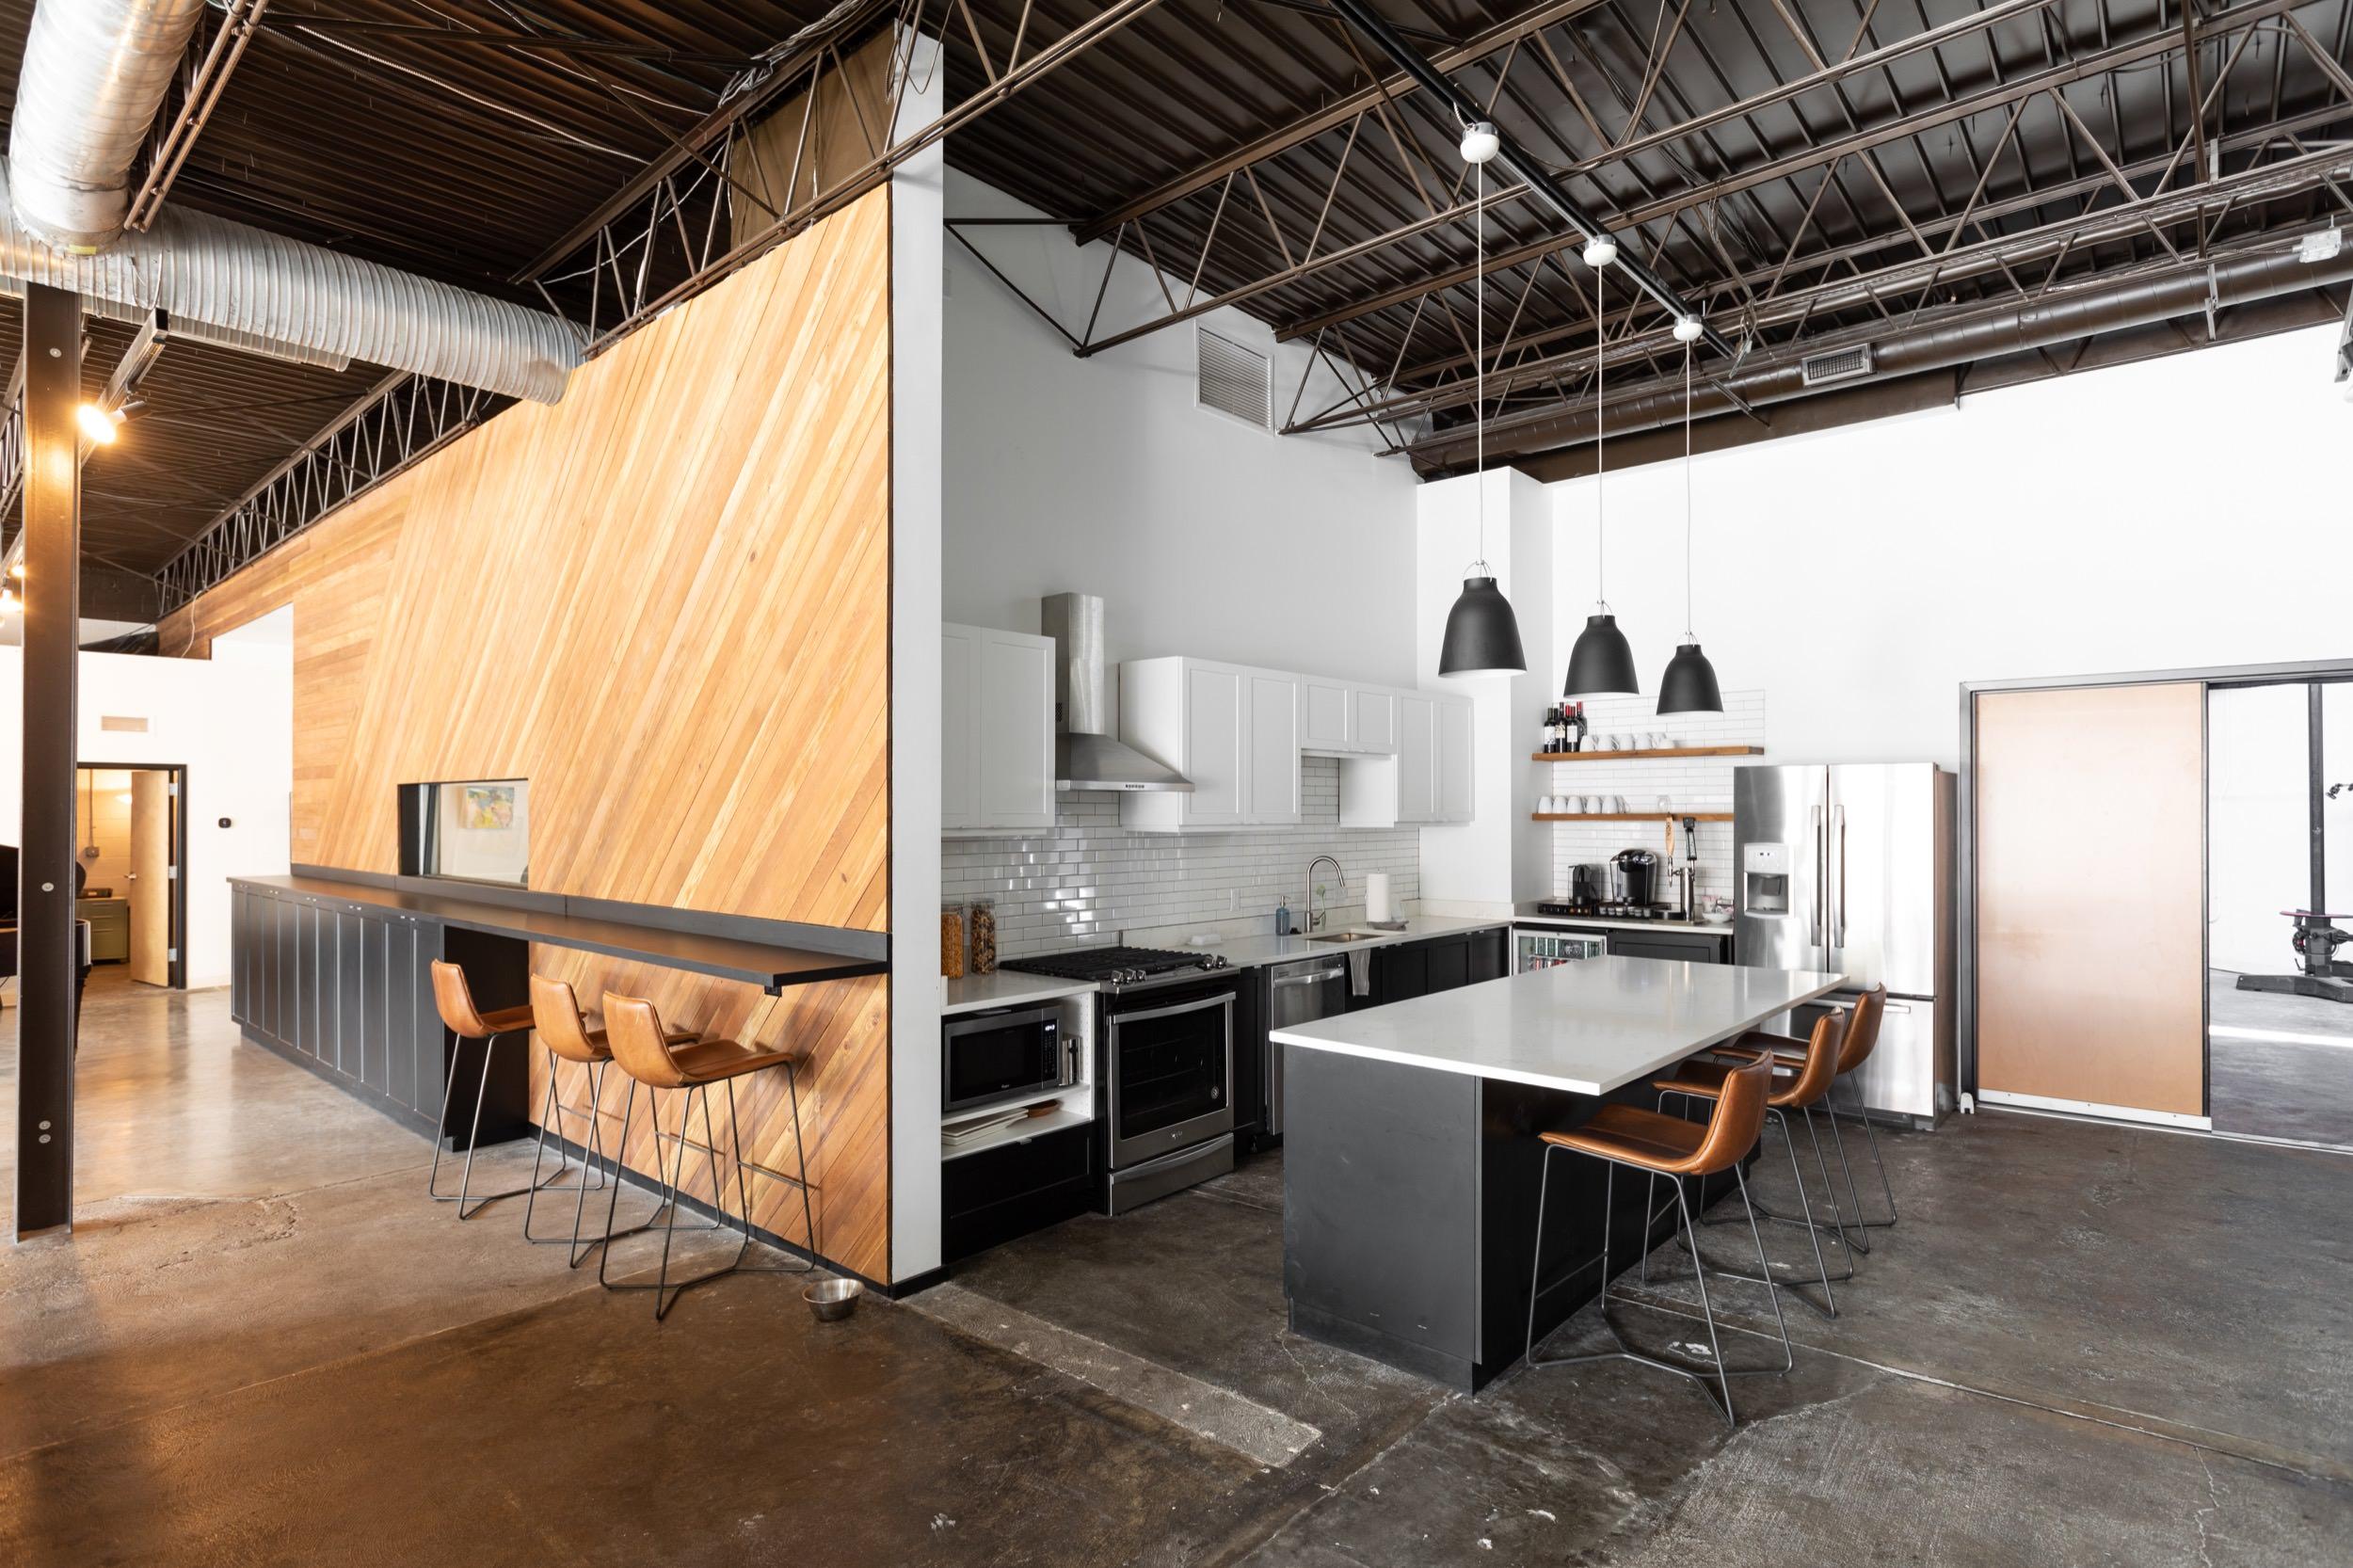 Kitchen and bar seating at BicMedia